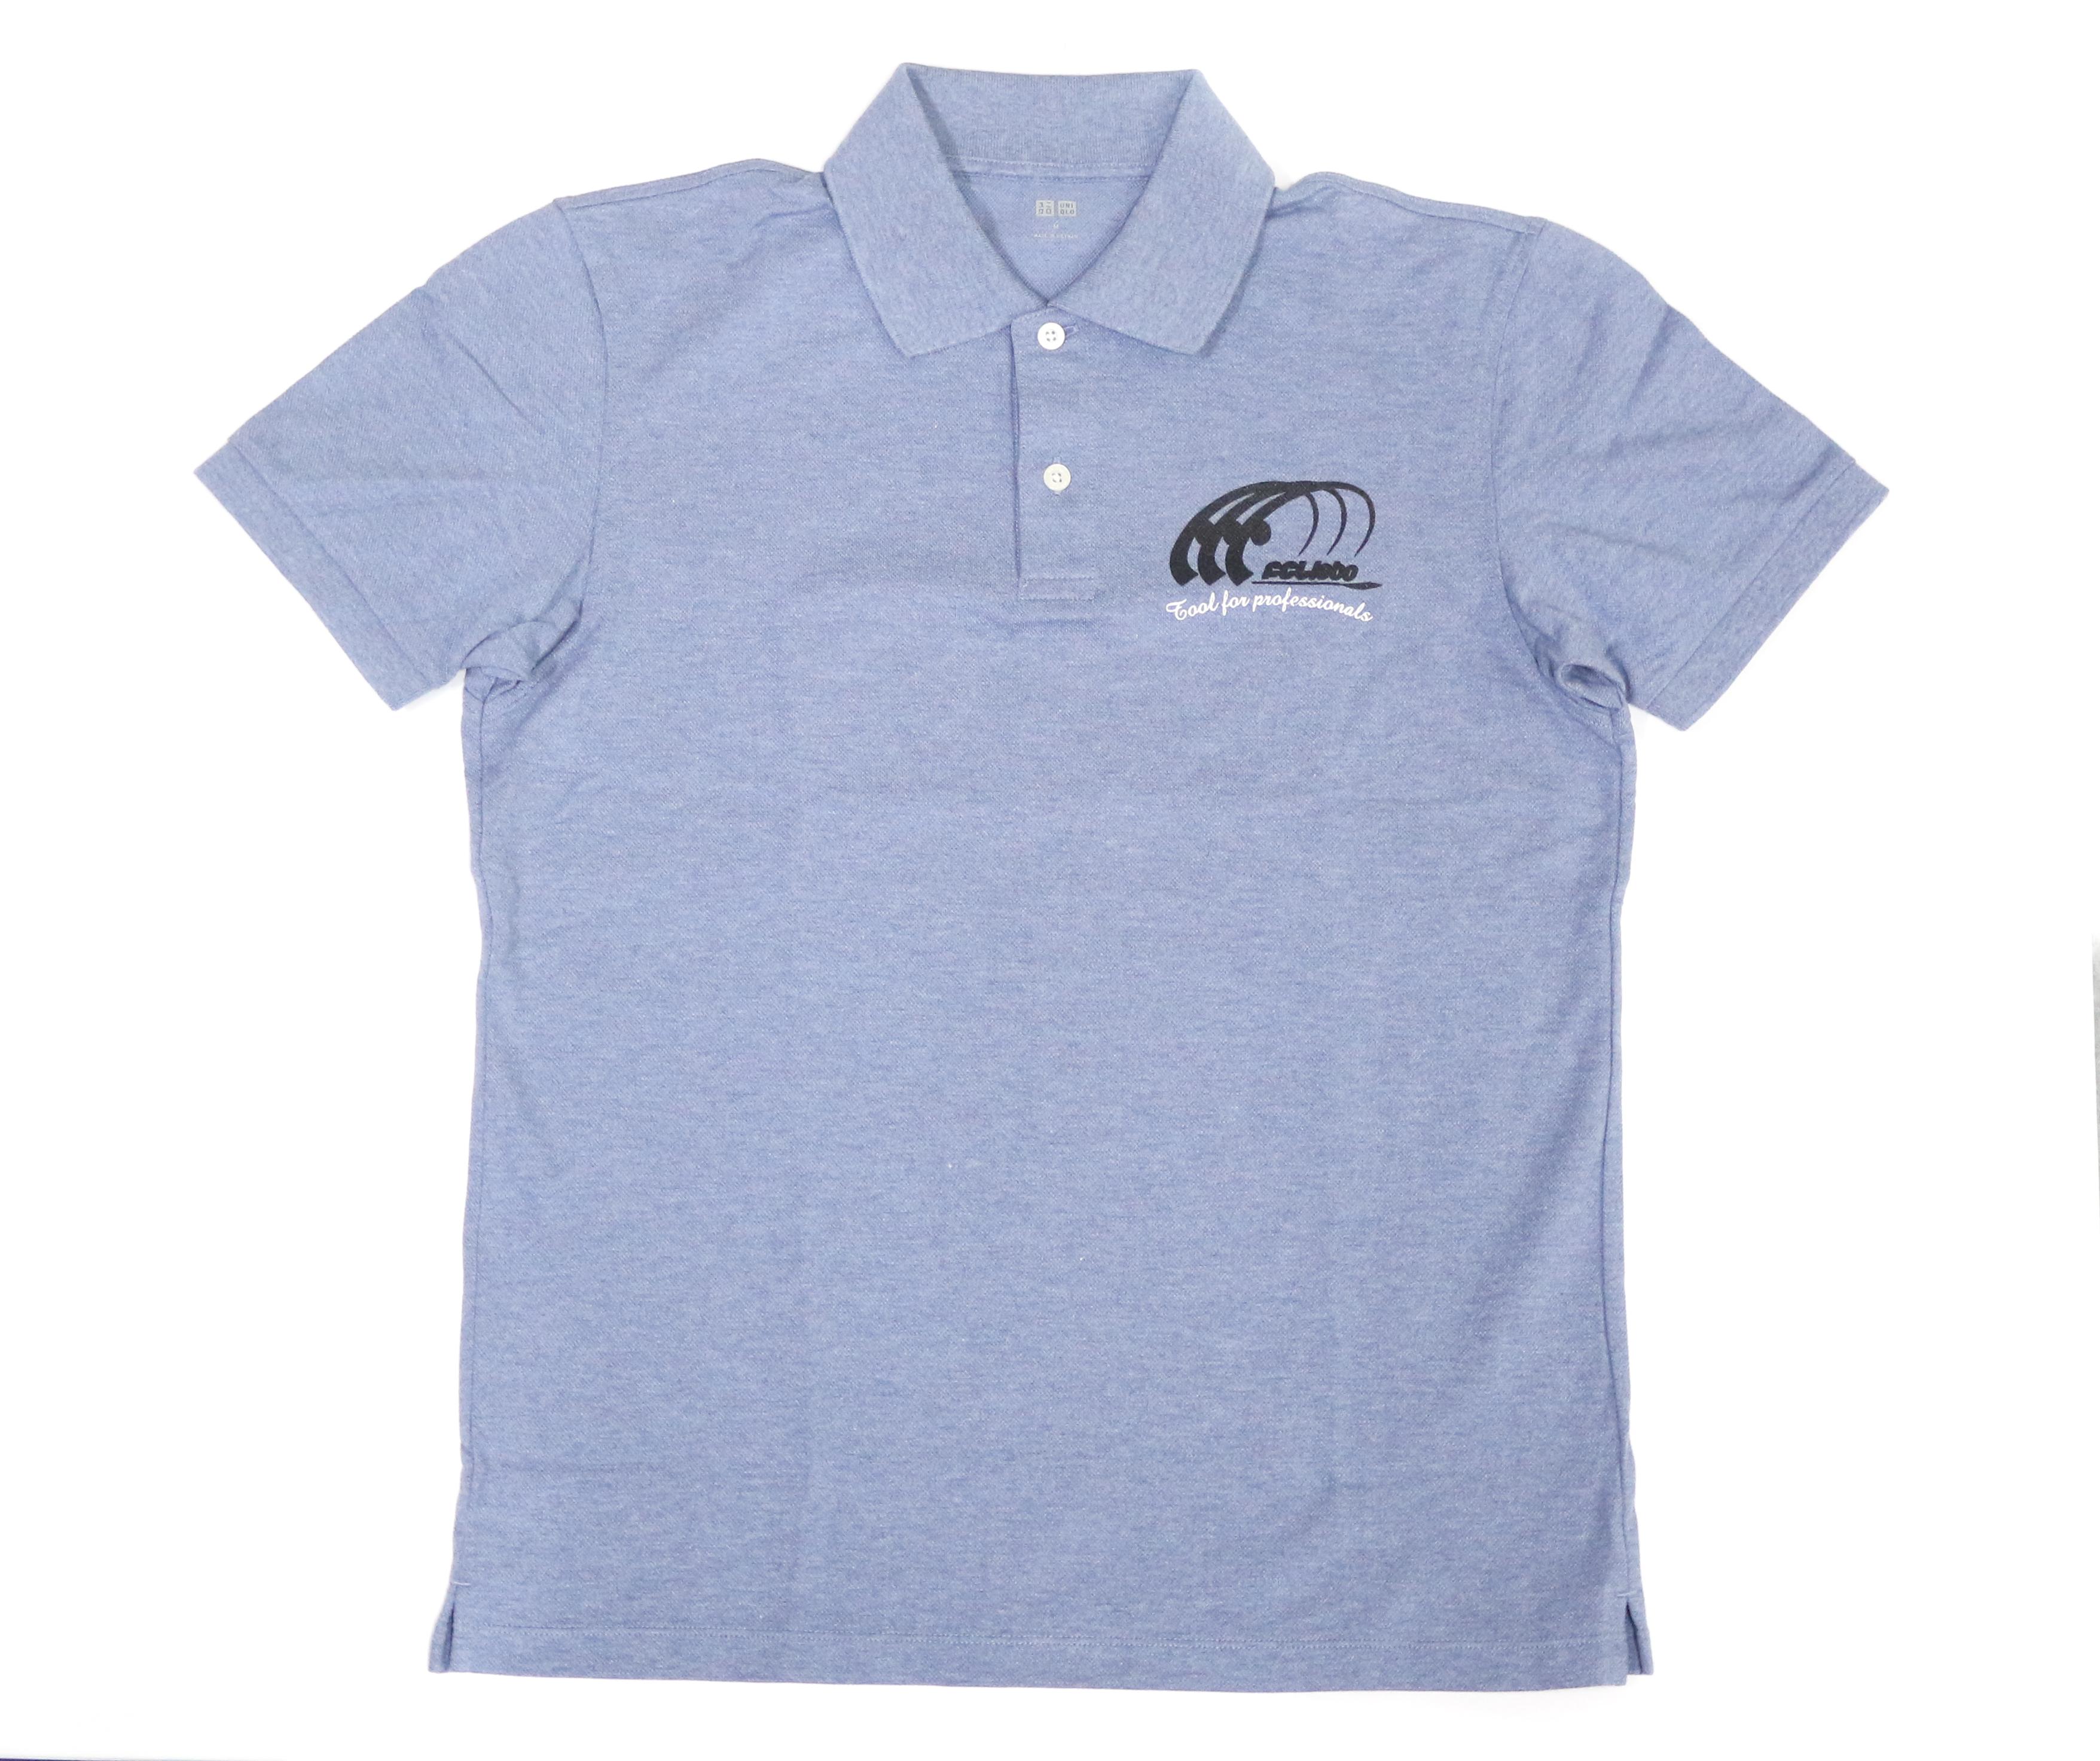 Sale FCL Labo Polo Shirt Short Sleeve Size XL Blue (blue)